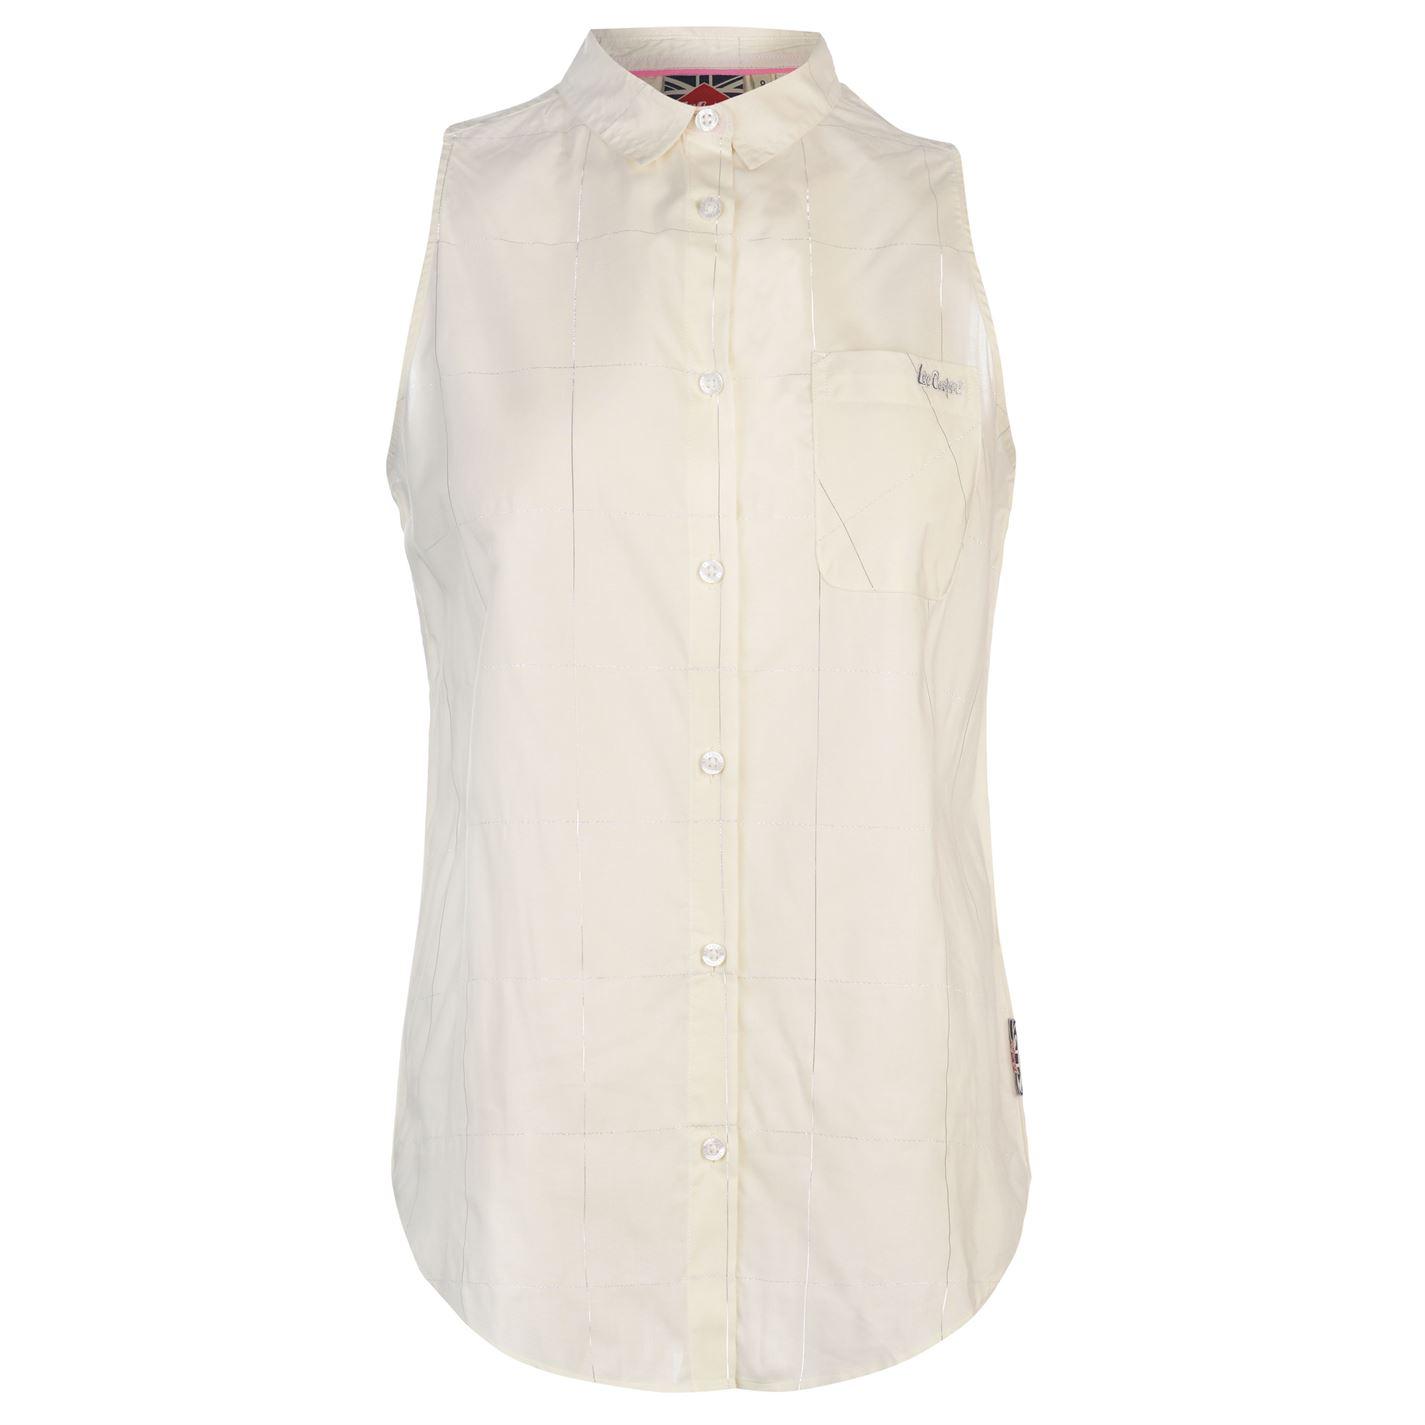 Lee Cooper Sleeveless Shirt Ladies